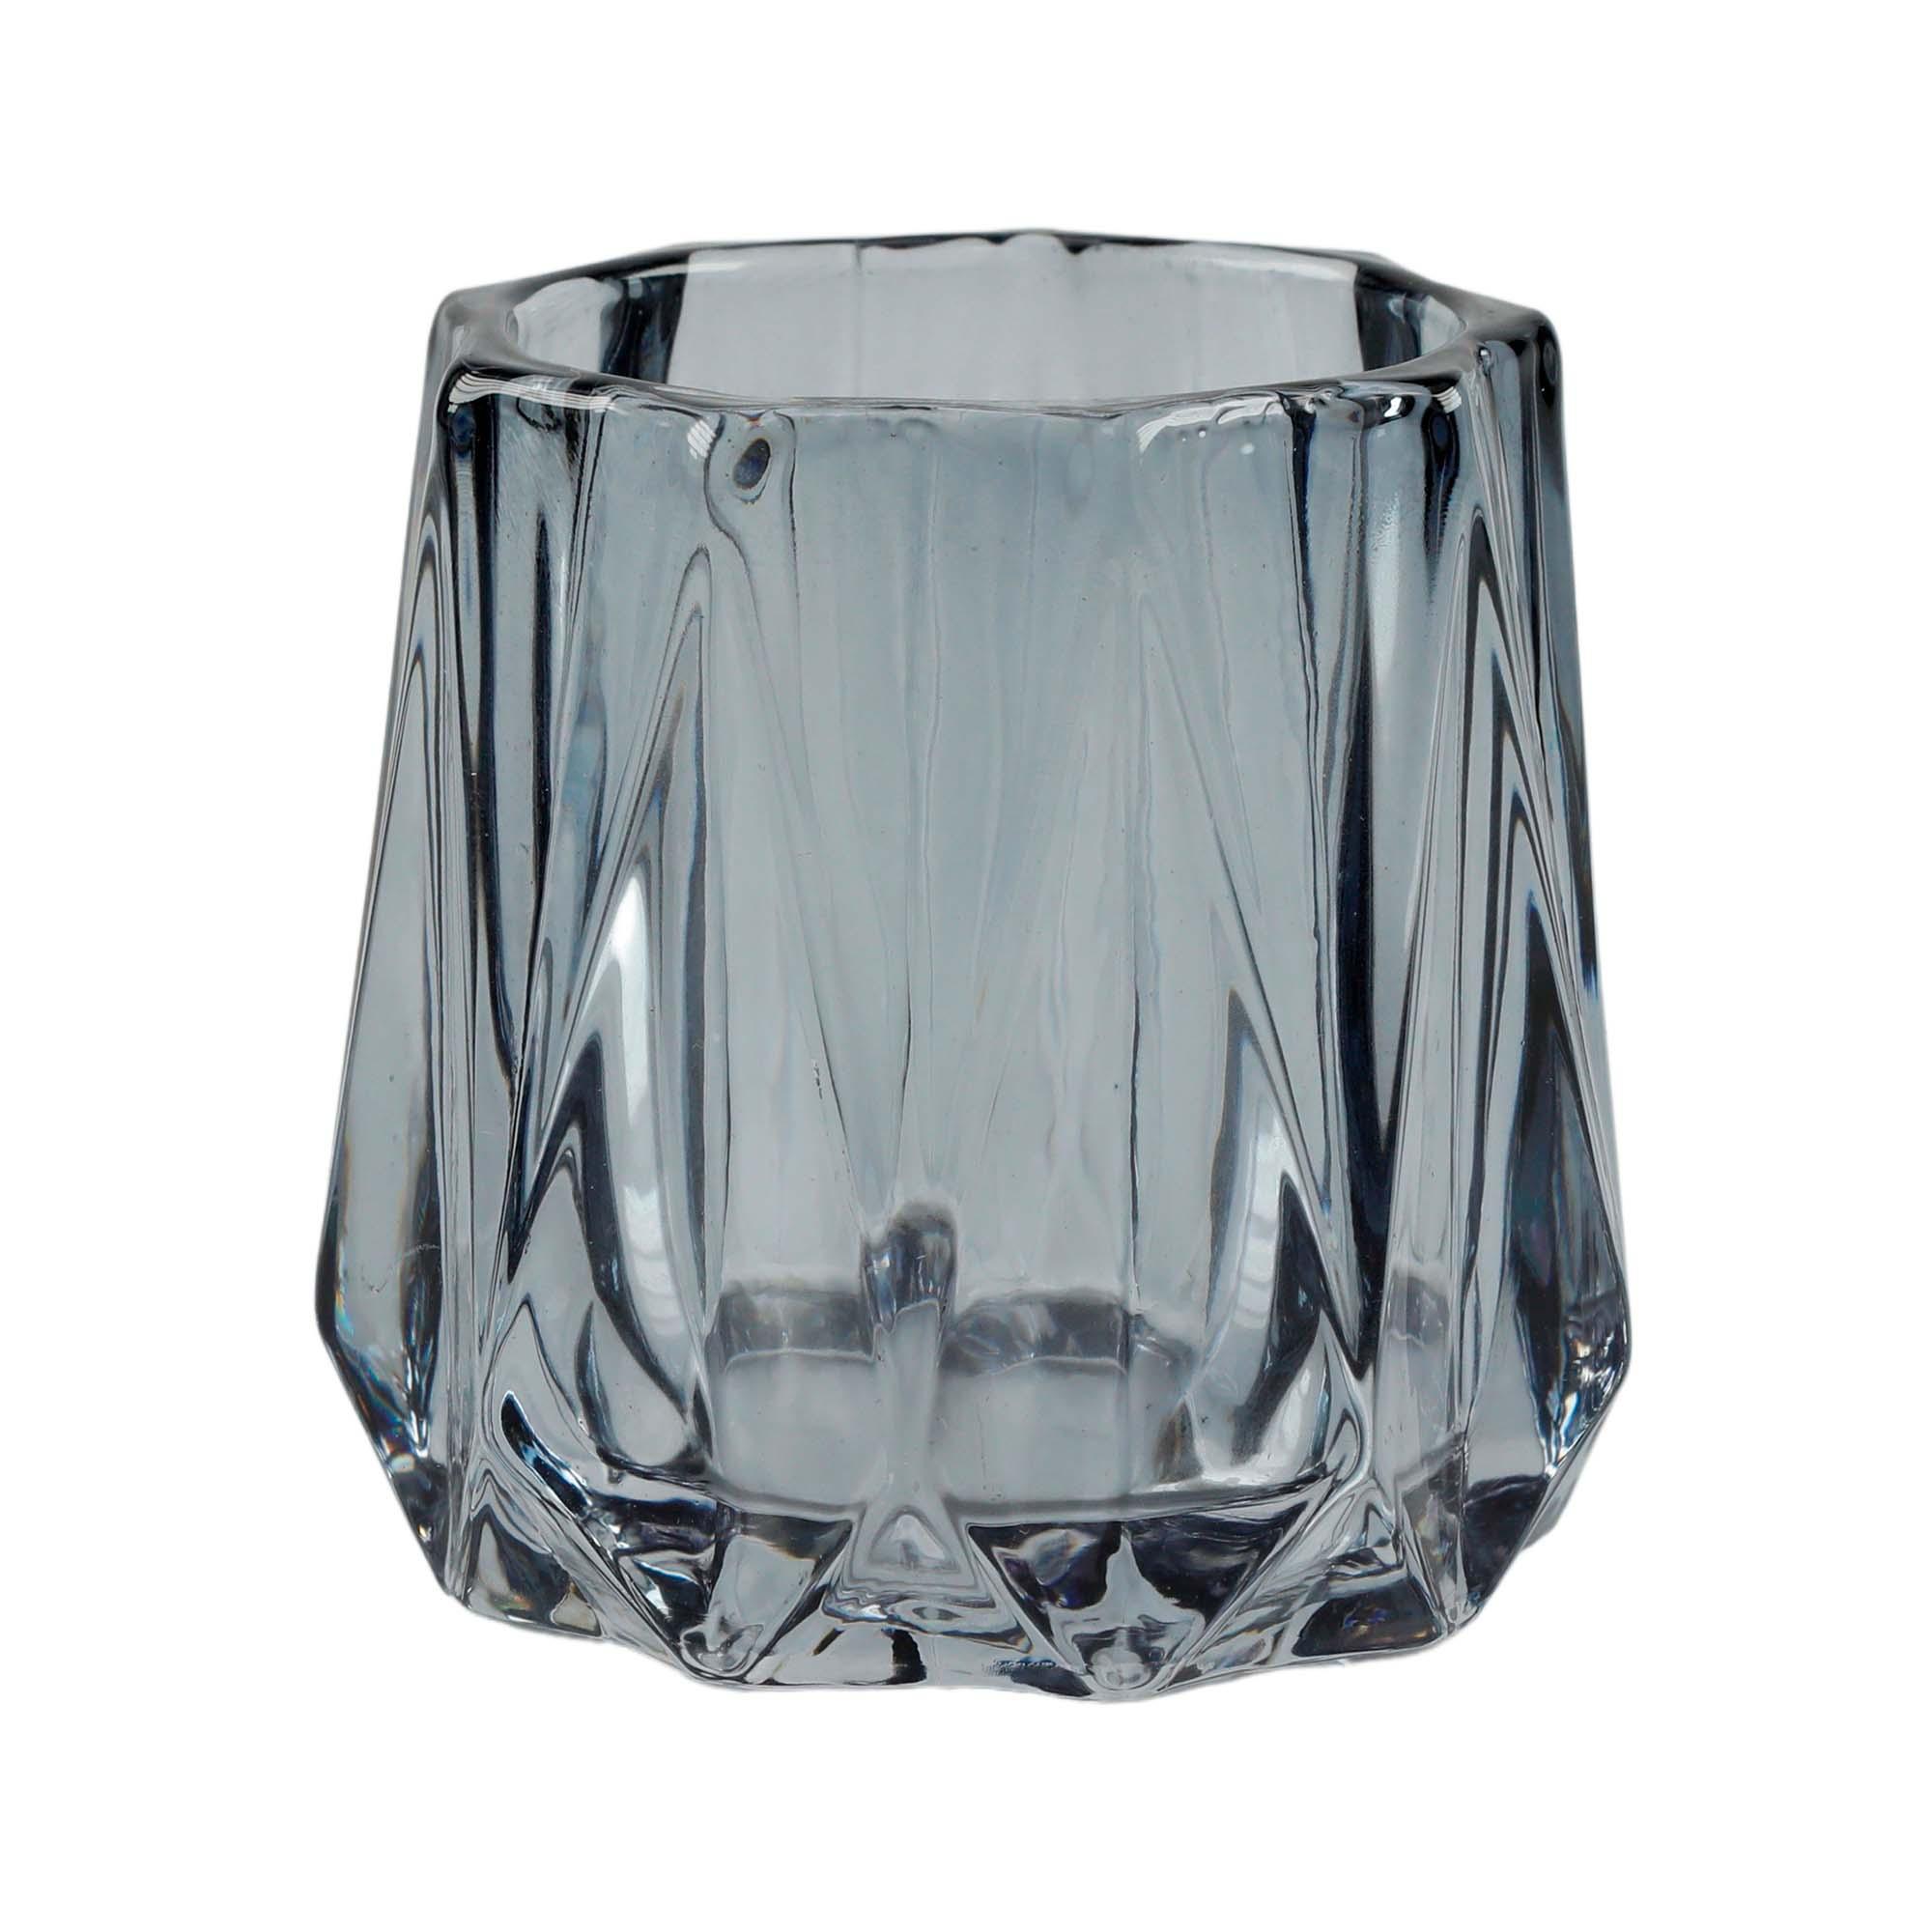 Copo de vidro decorativo